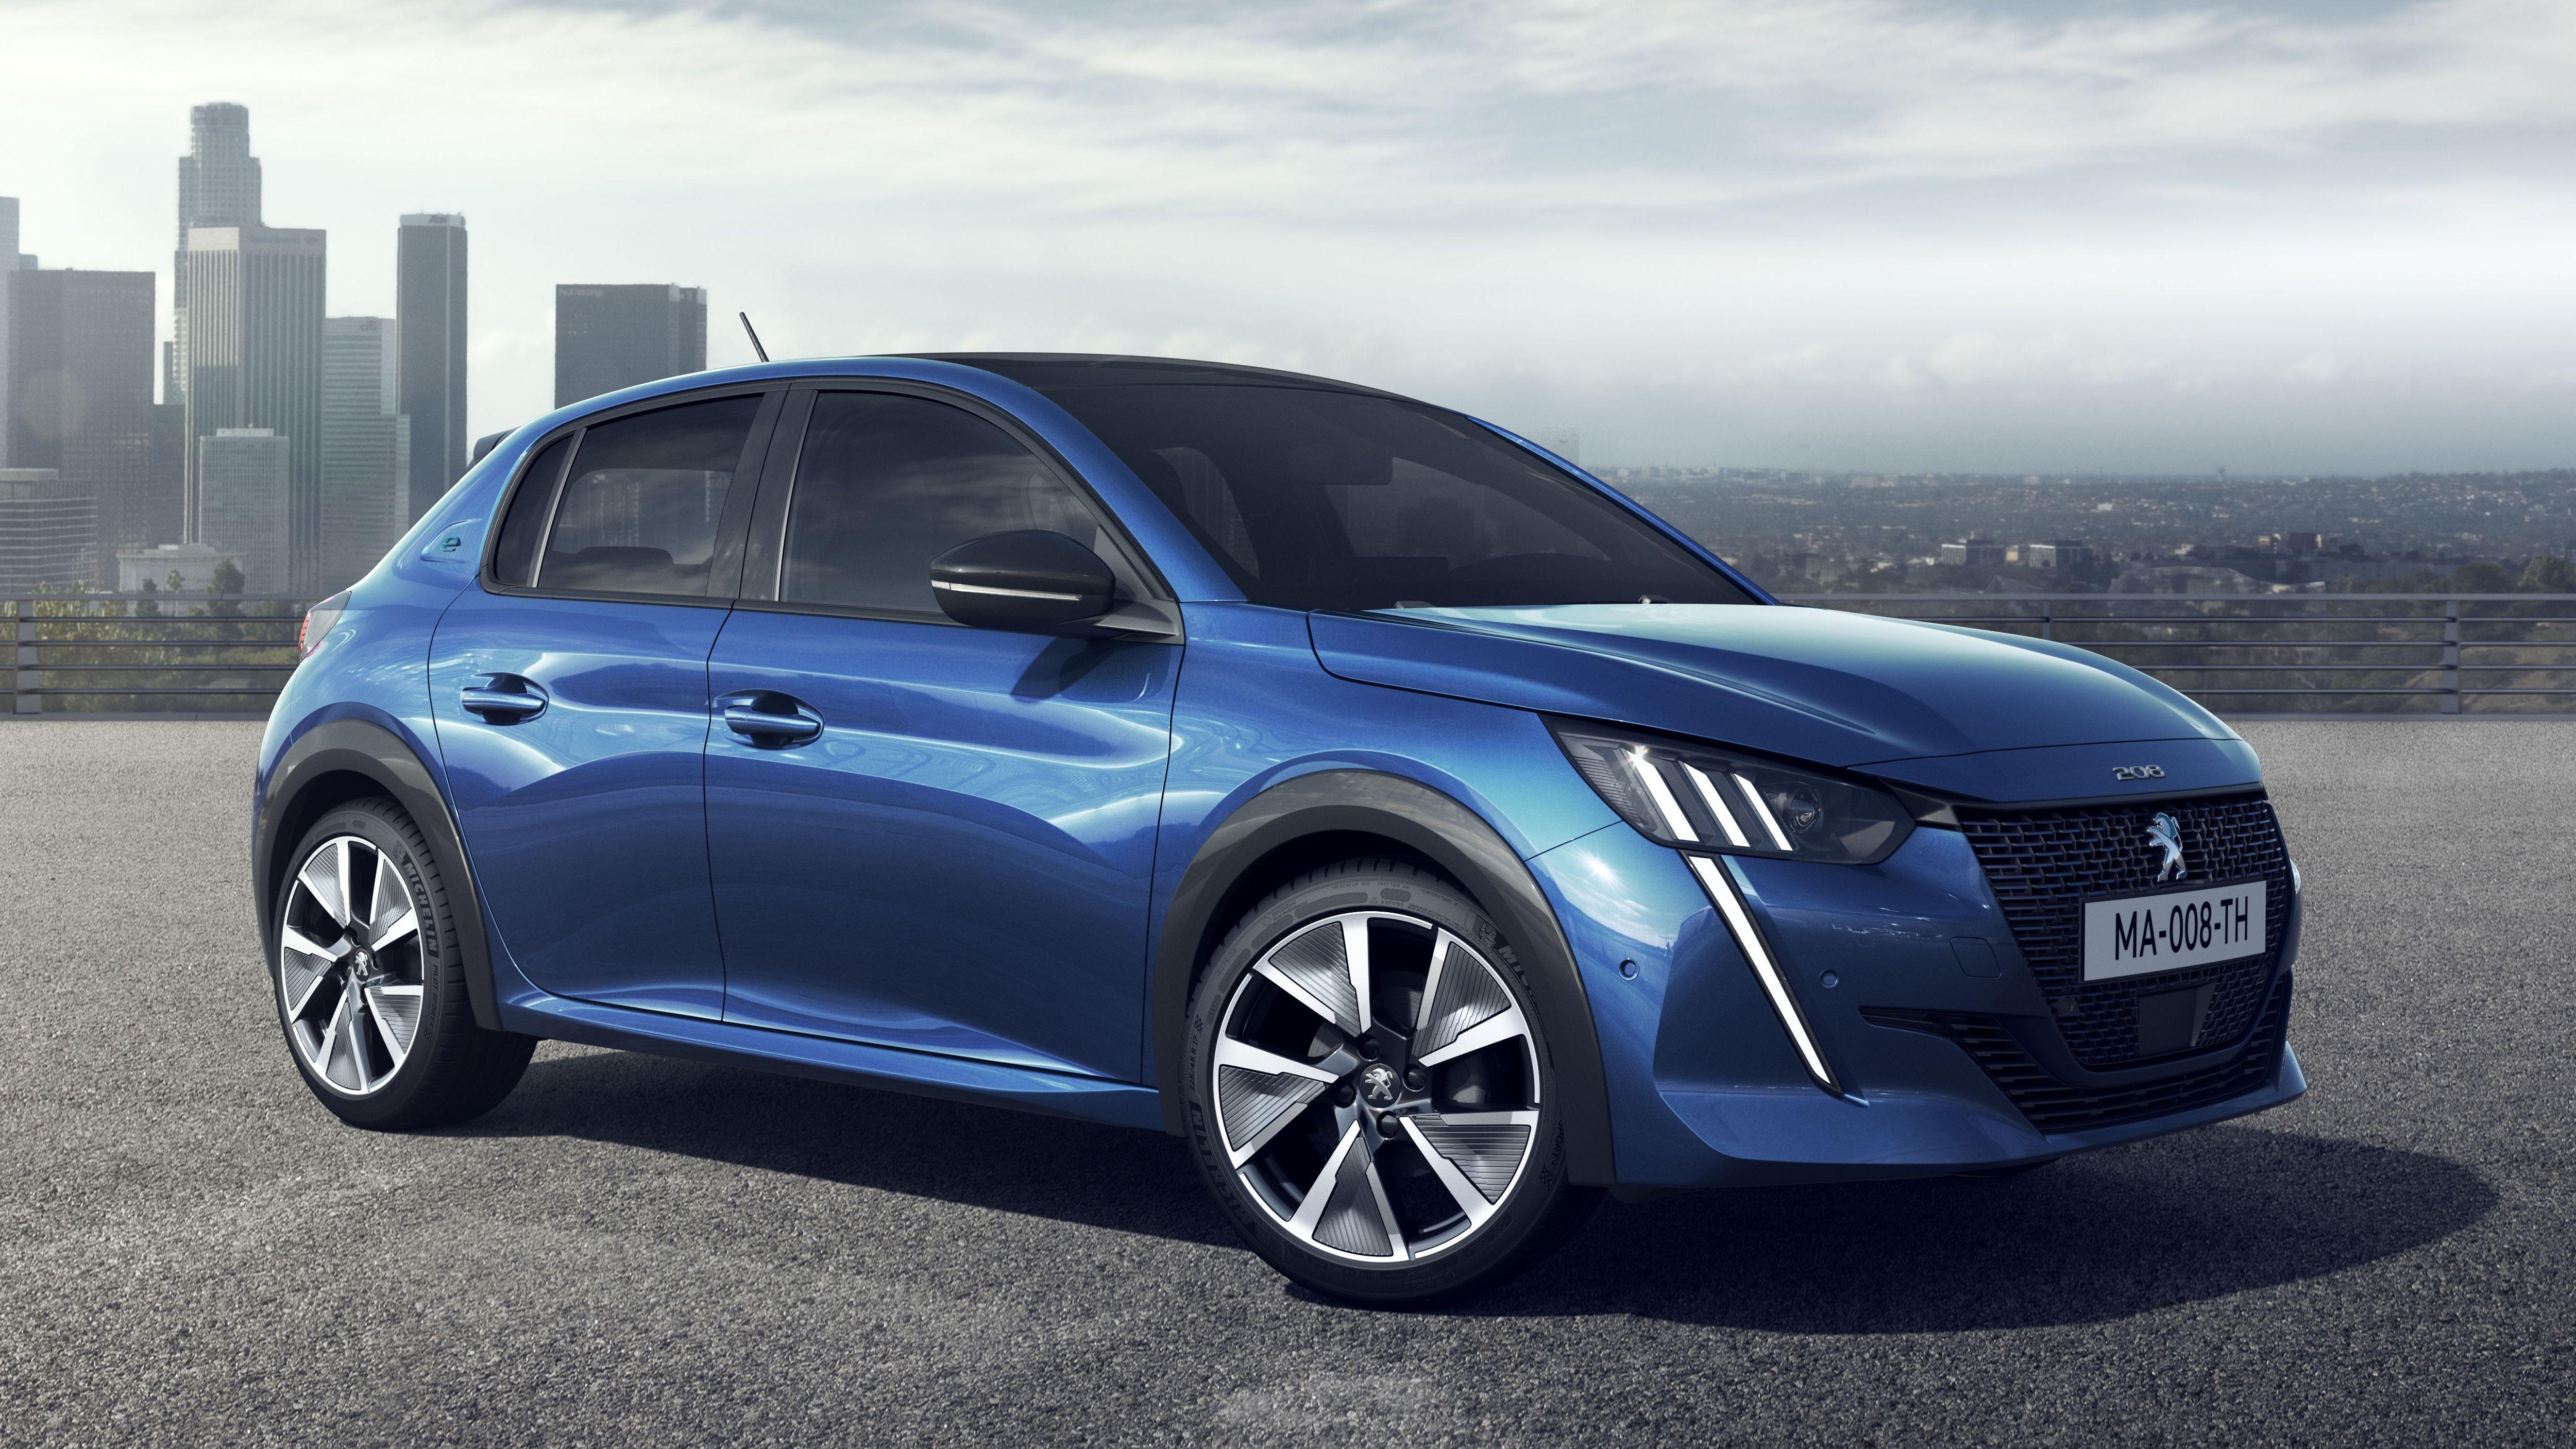 2019 Peugeot 208 Peugeot, Electric cars, Latest cars